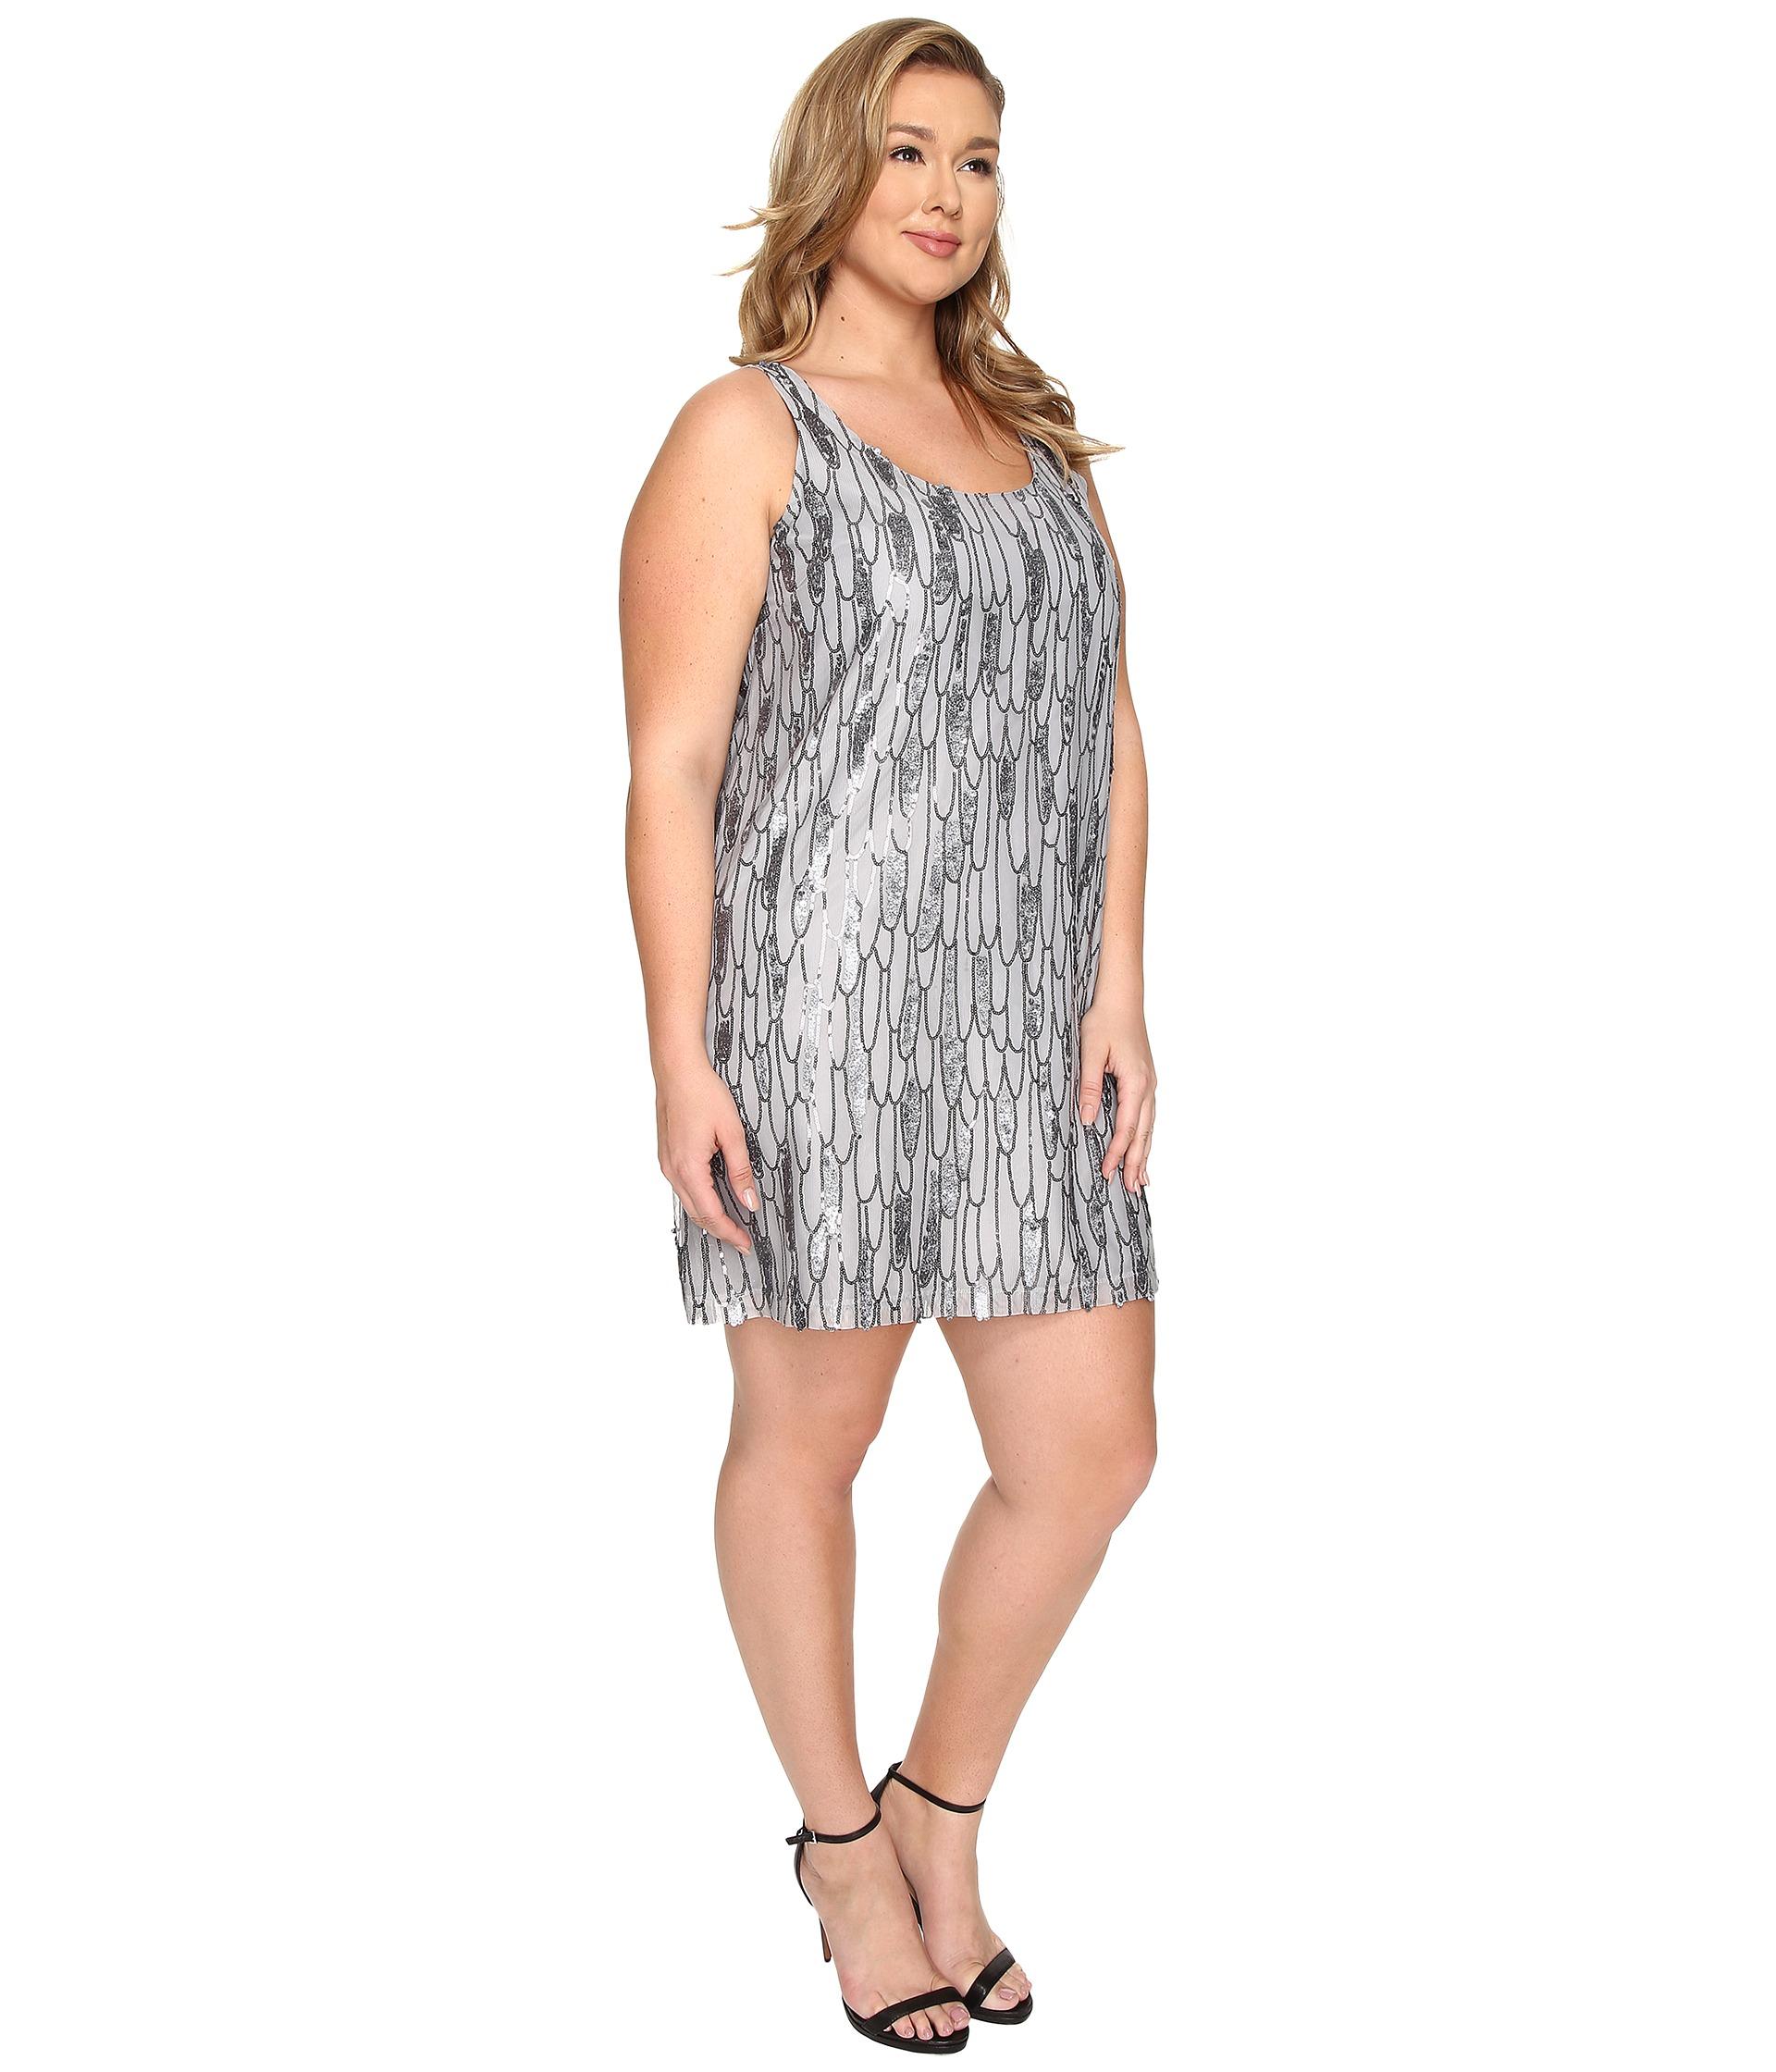 Bb dakota Plus Size Firoella Sequin Tank Dress in Metallic  Lyst